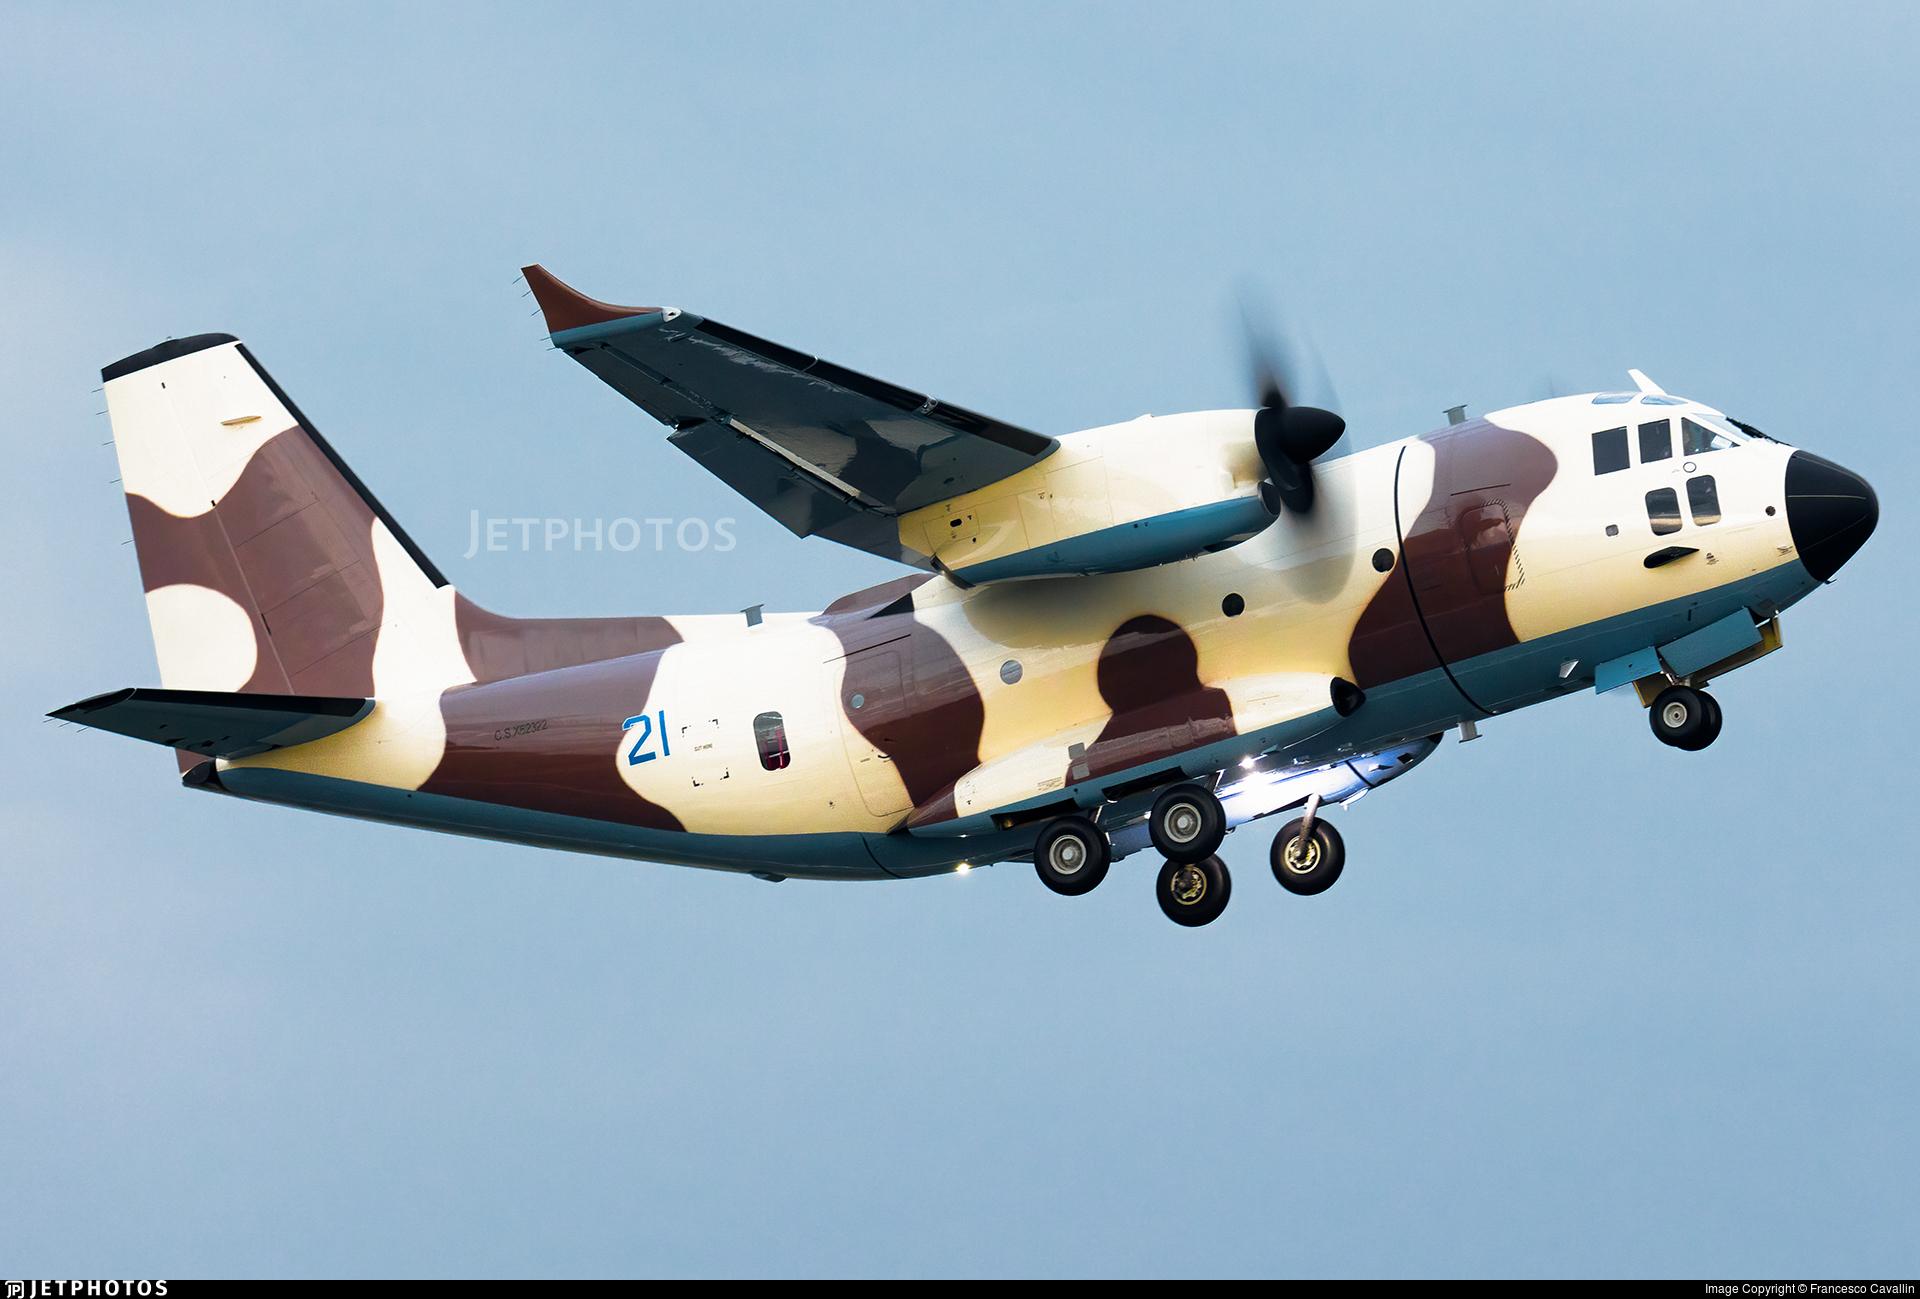 CSX62322 - Alenia C-27J Spartan NG - Alenia Aeronautica